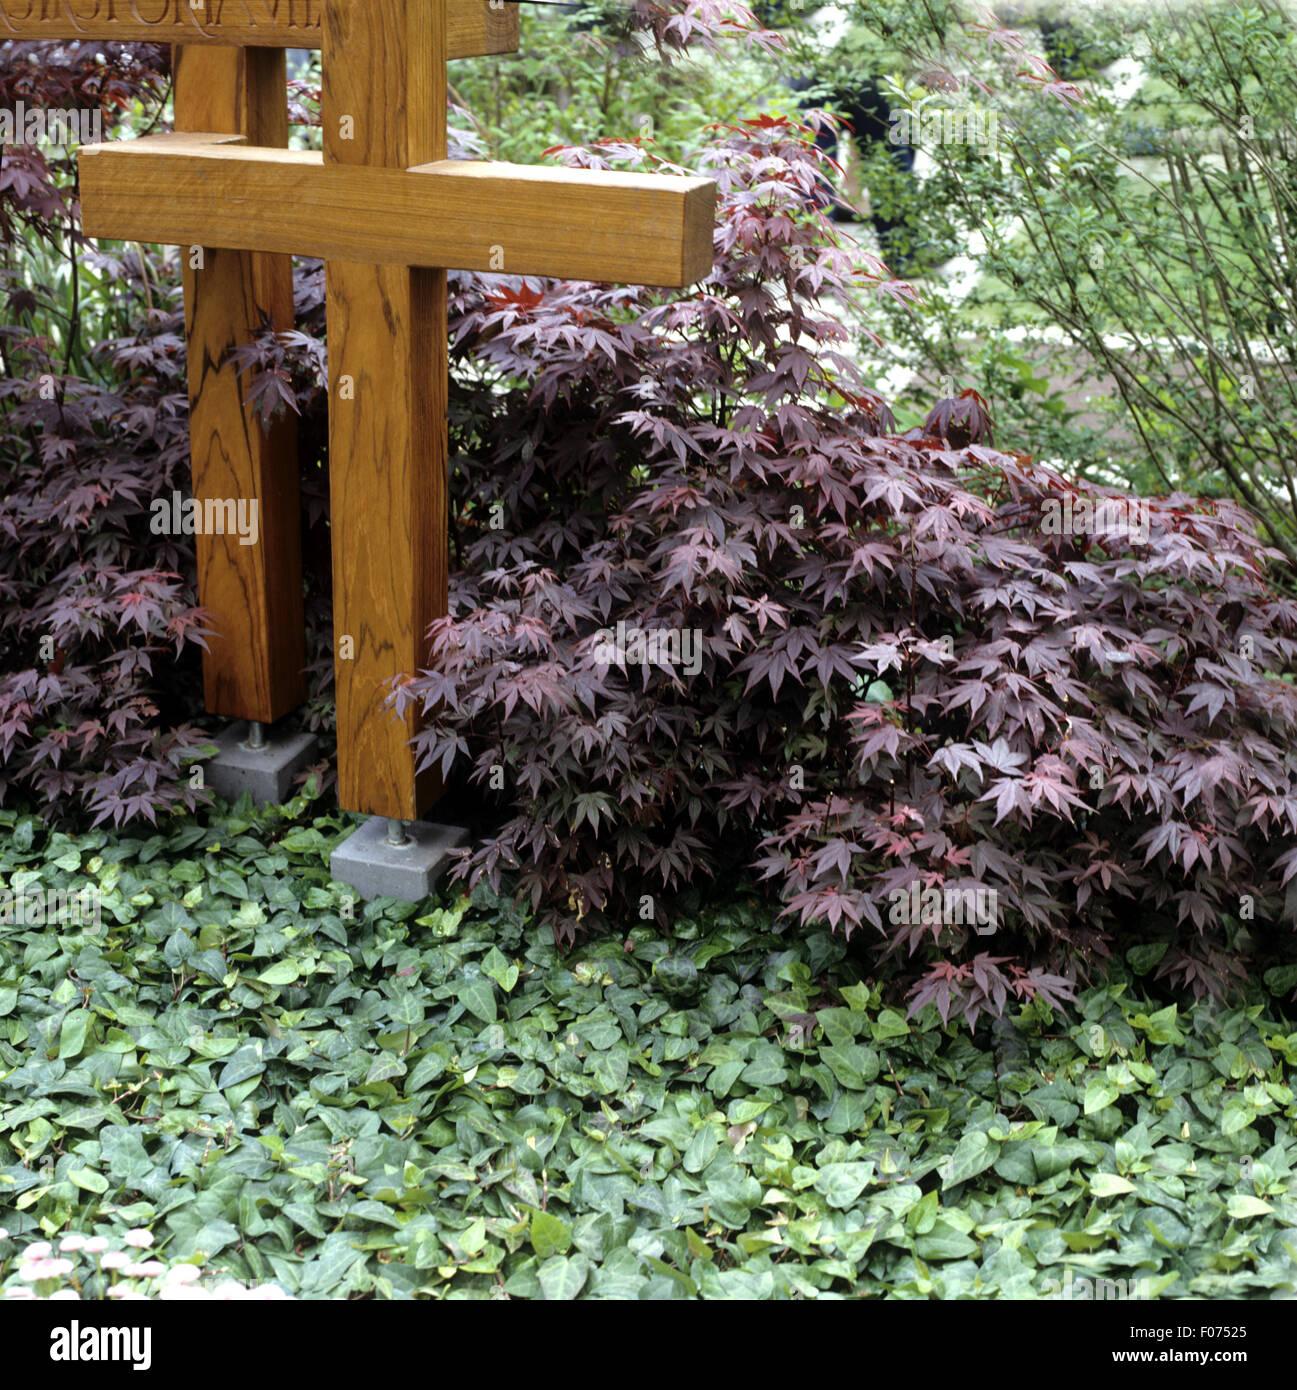 grabbepflanzung faecherahorn stockfoto bild 86209485 alamy. Black Bedroom Furniture Sets. Home Design Ideas